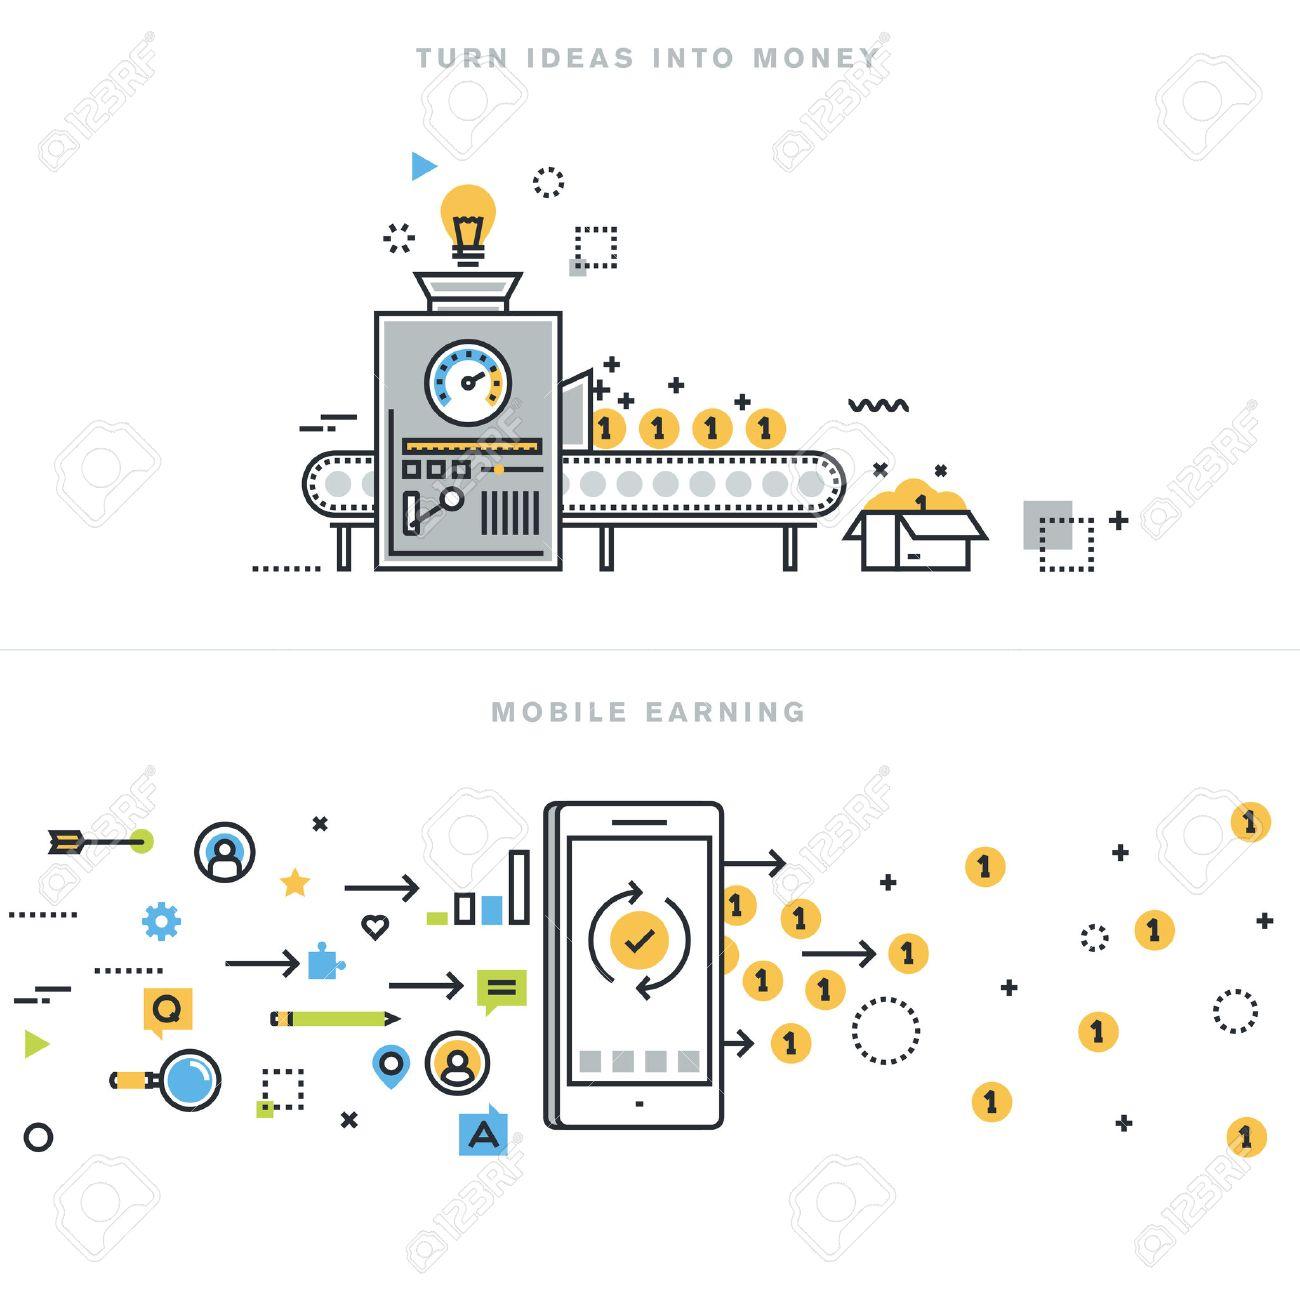 Flat Line Design Vector Illustration Concepts For Earning Money Online,  Mobile Earning, Business Ideas